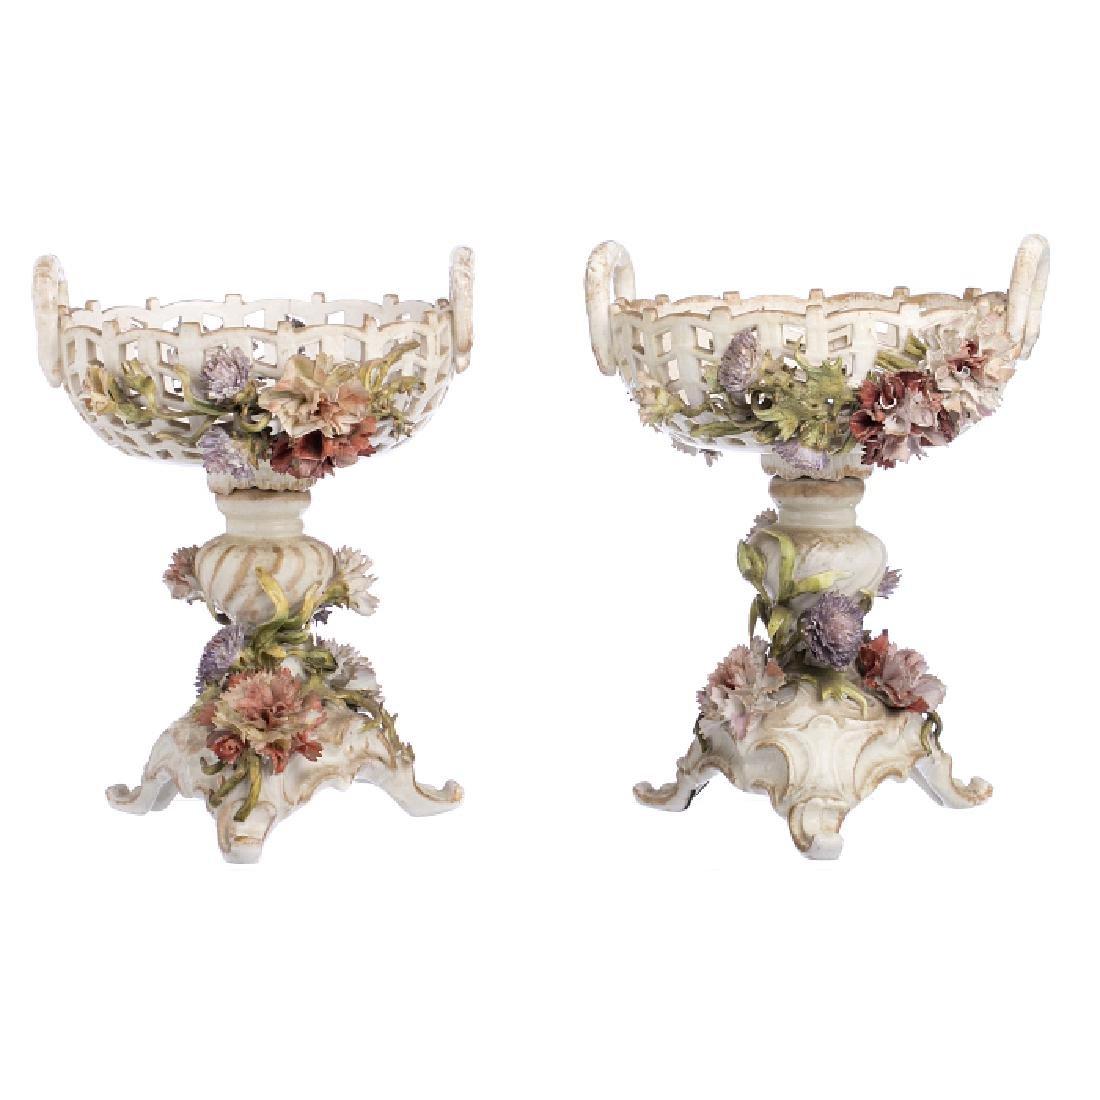 Pair of footed bowls in German porcelain